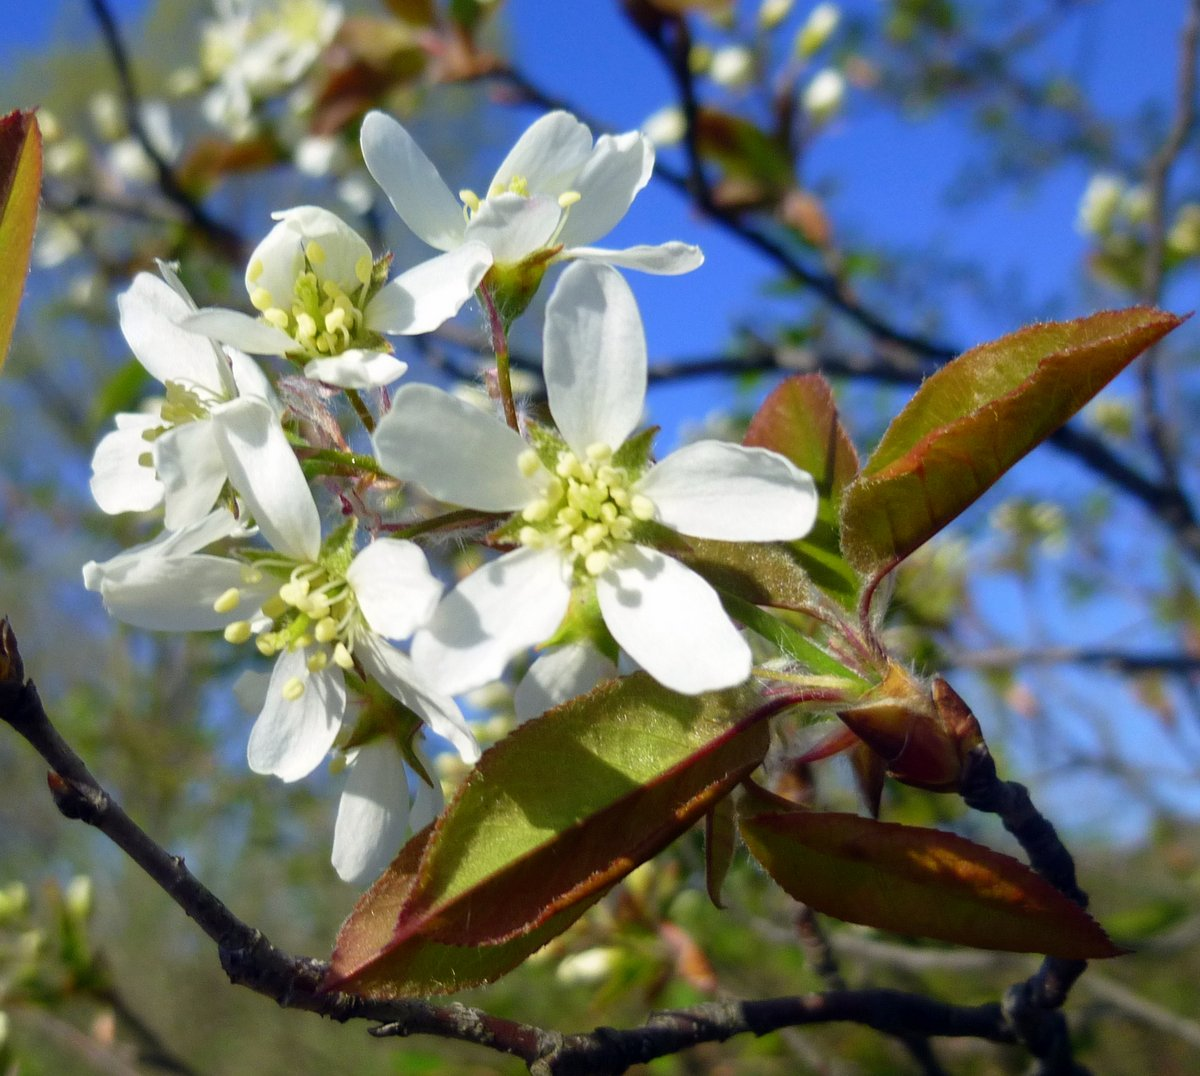 1. Wild Cherry Blossoms